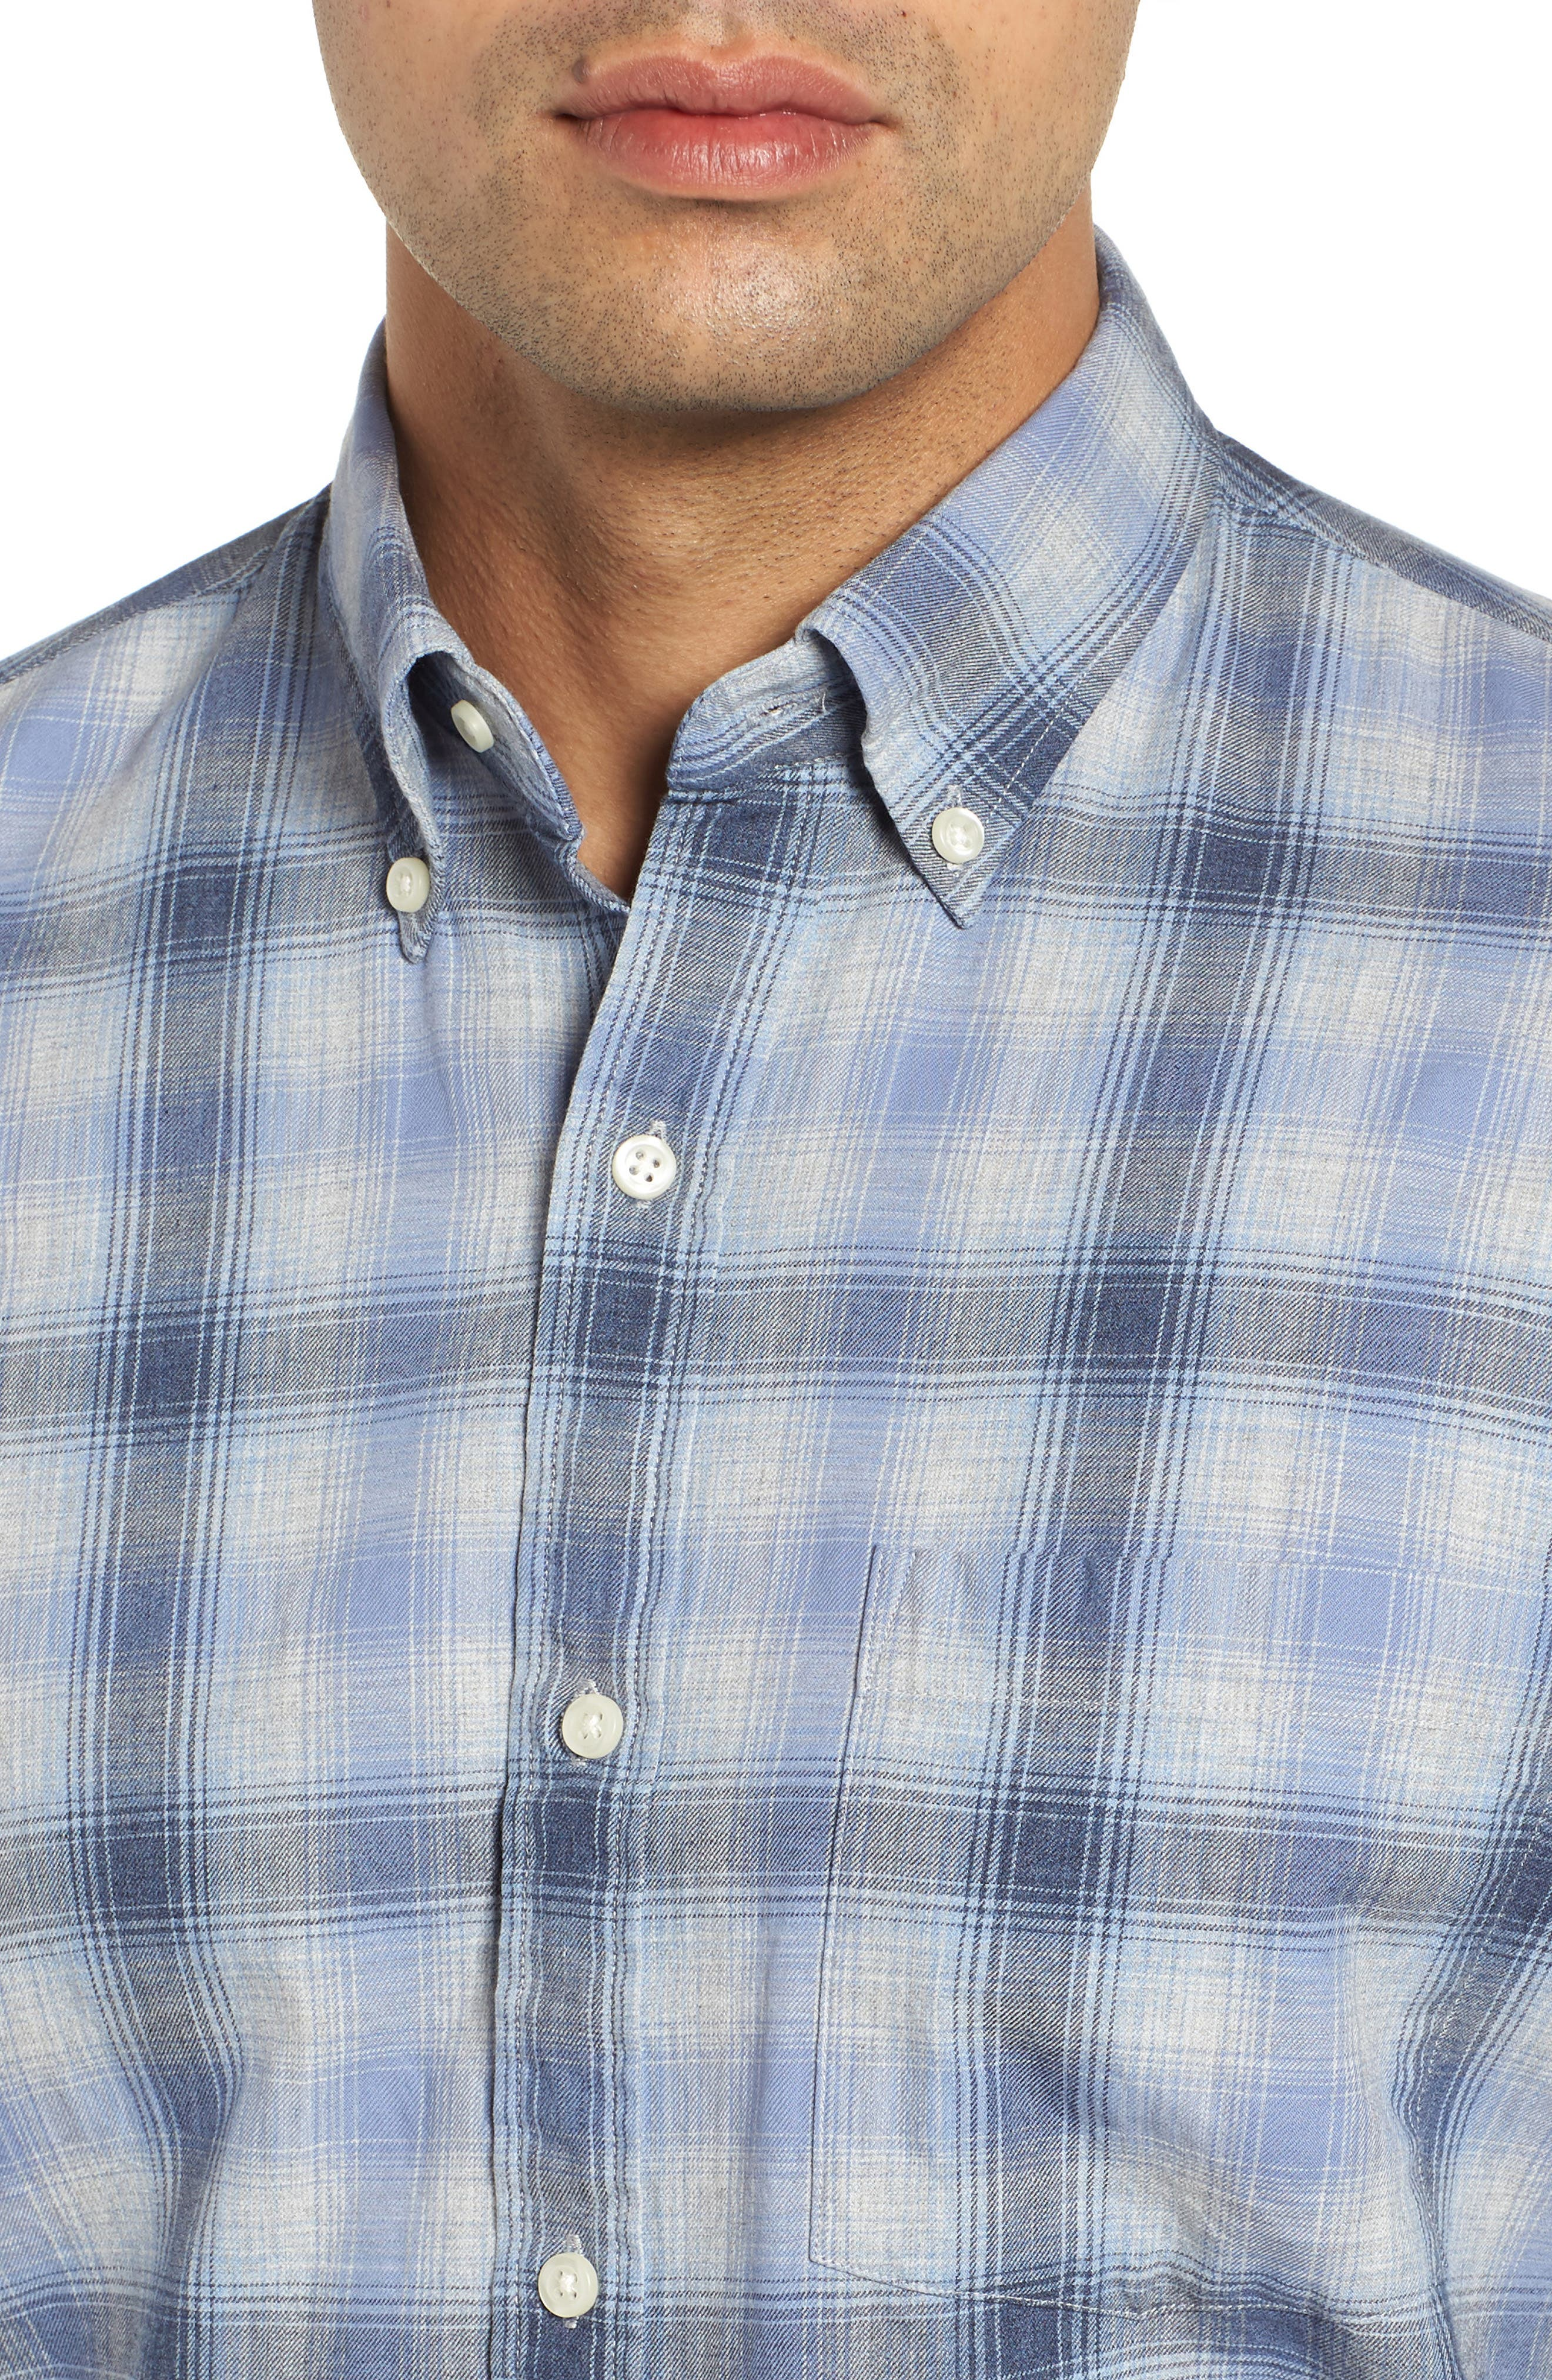 Mountain Fog Plaid Sport Shirt,                             Alternate thumbnail 2, color,                             ATLANTIC BLUE